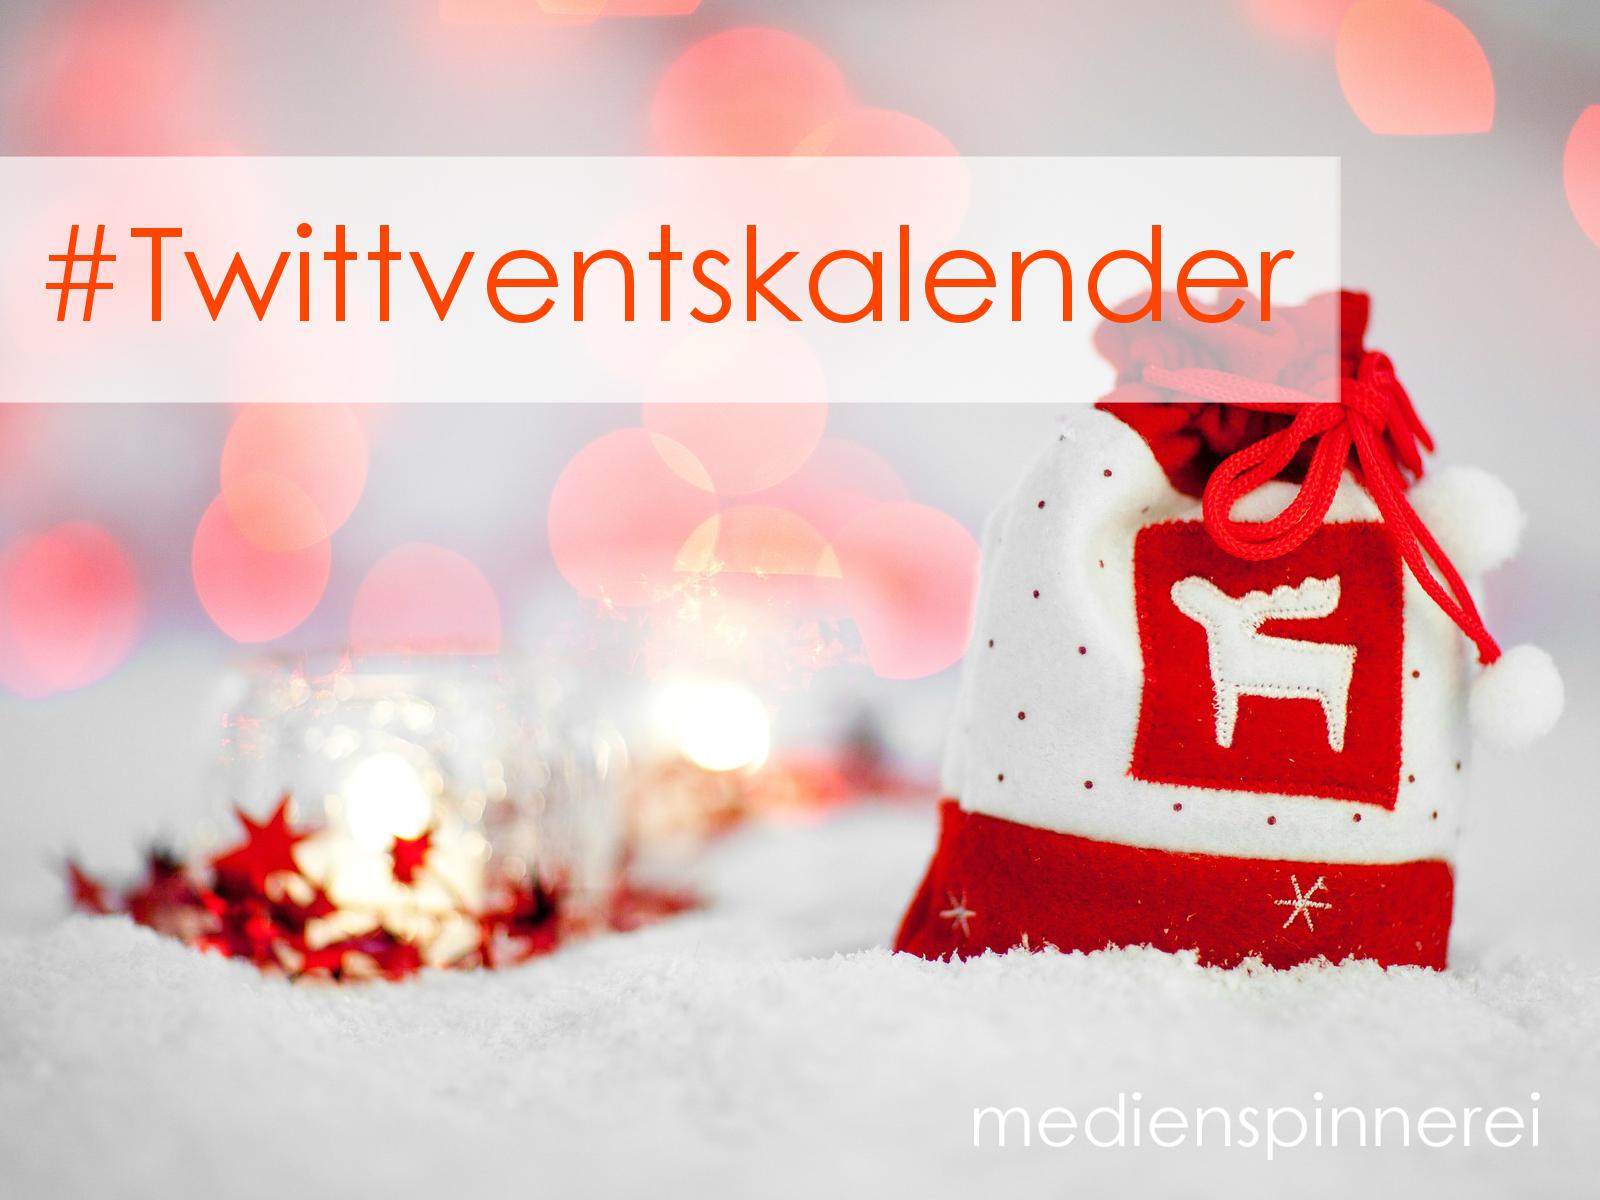 Twittventskalender 2014 - medienspinnerei